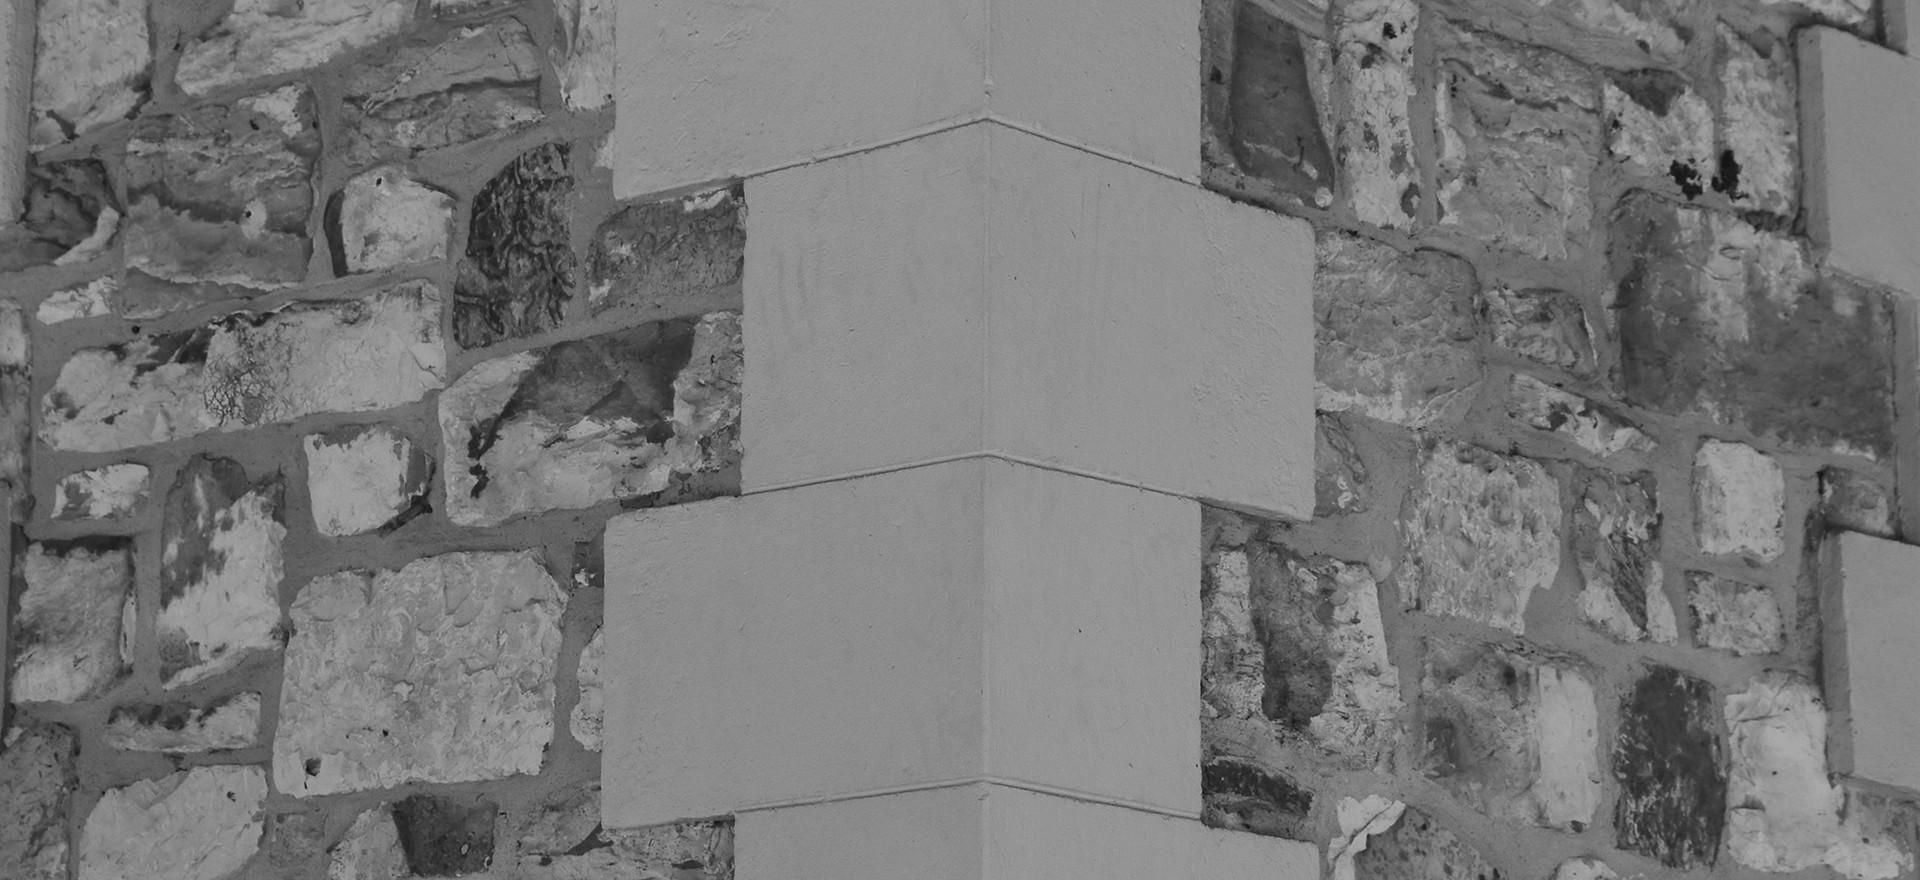 1880s style corner rendering of porcellanite walls, Darwin.